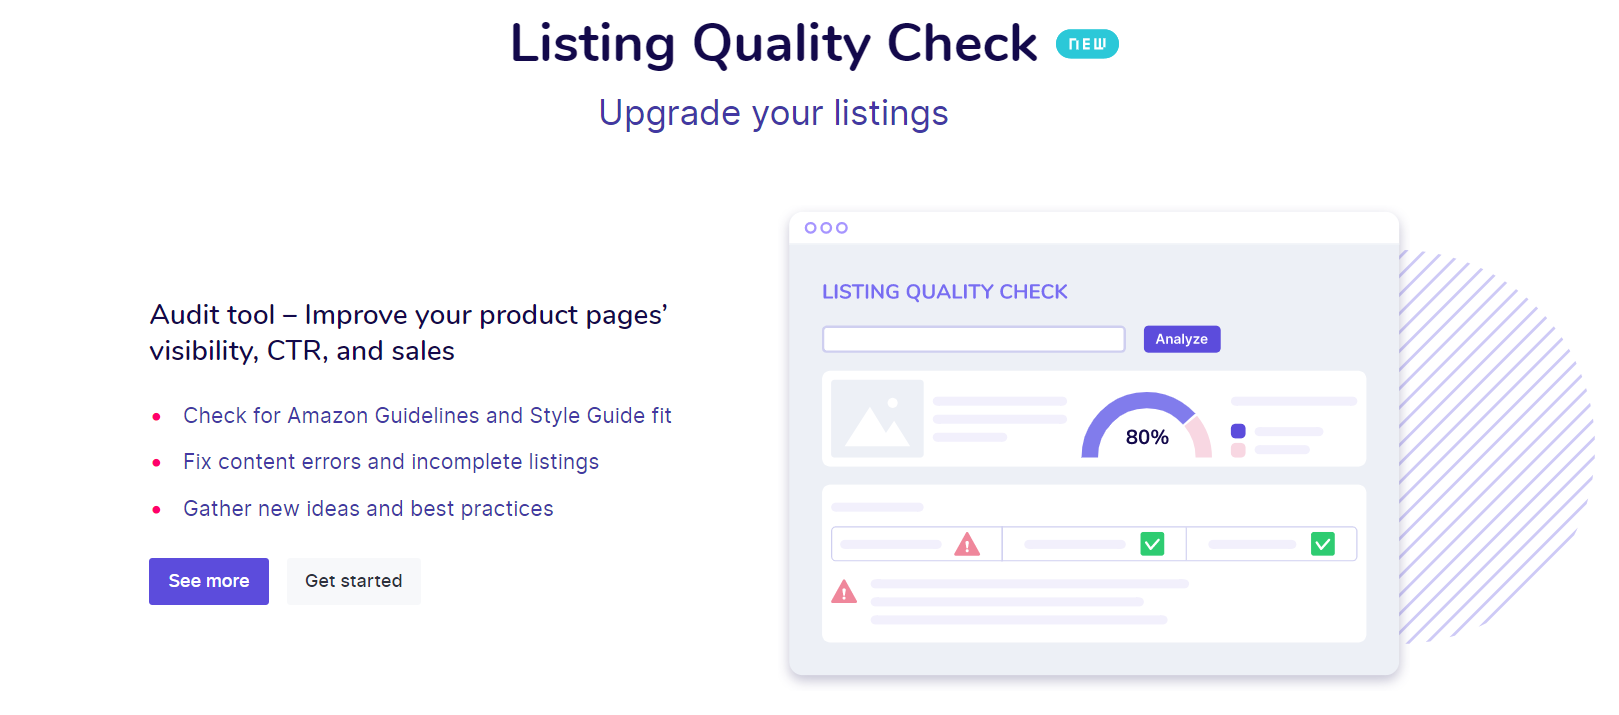 Listing Quality Check